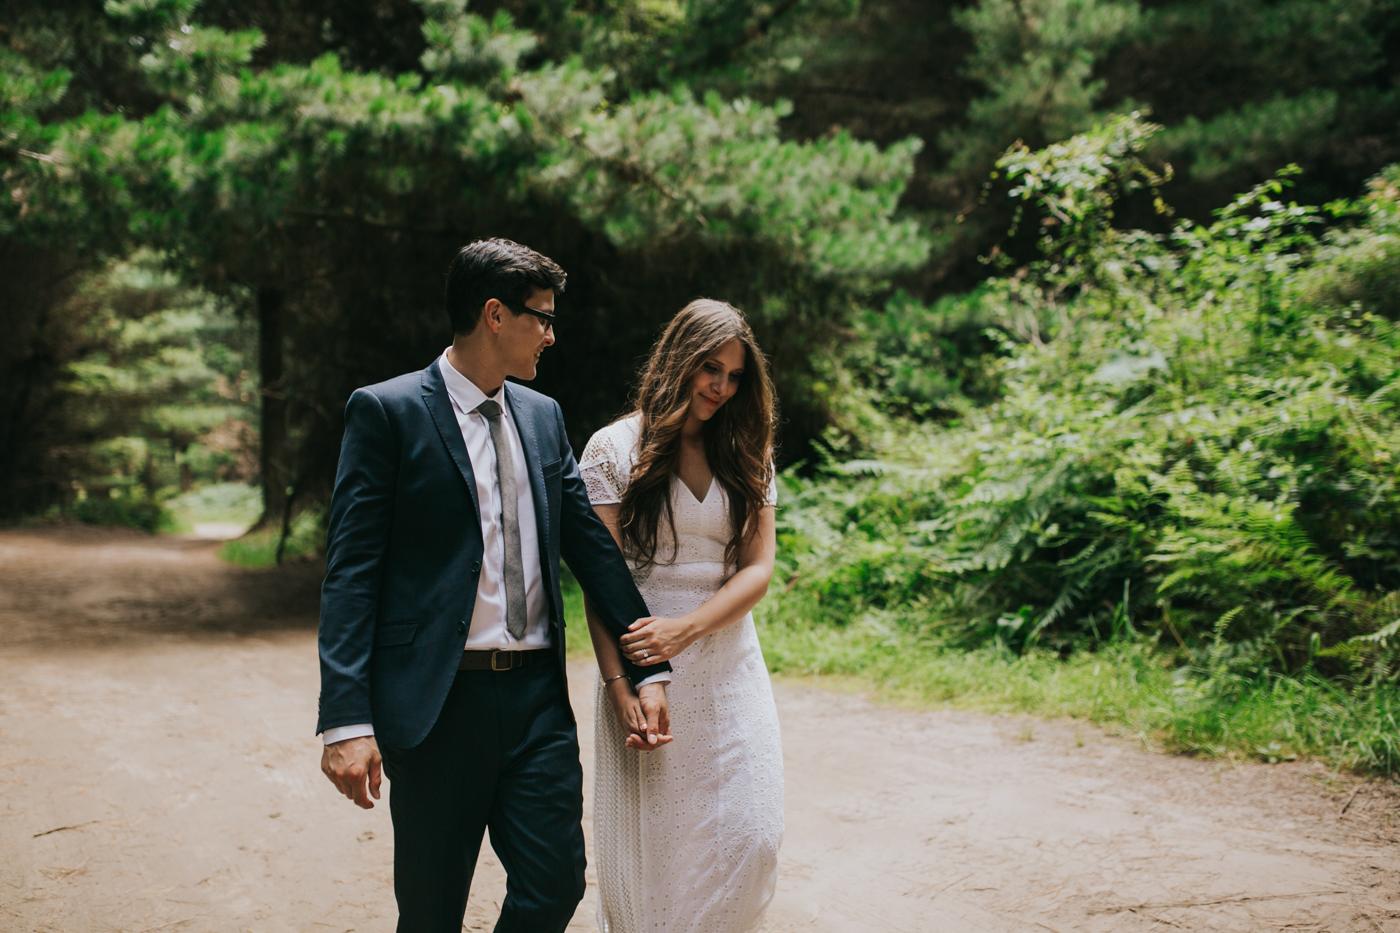 Ariana & Tim - Dunedin, New Zealand Wedding - Destination Wedding - Samantha Heather Photography-176.jpg